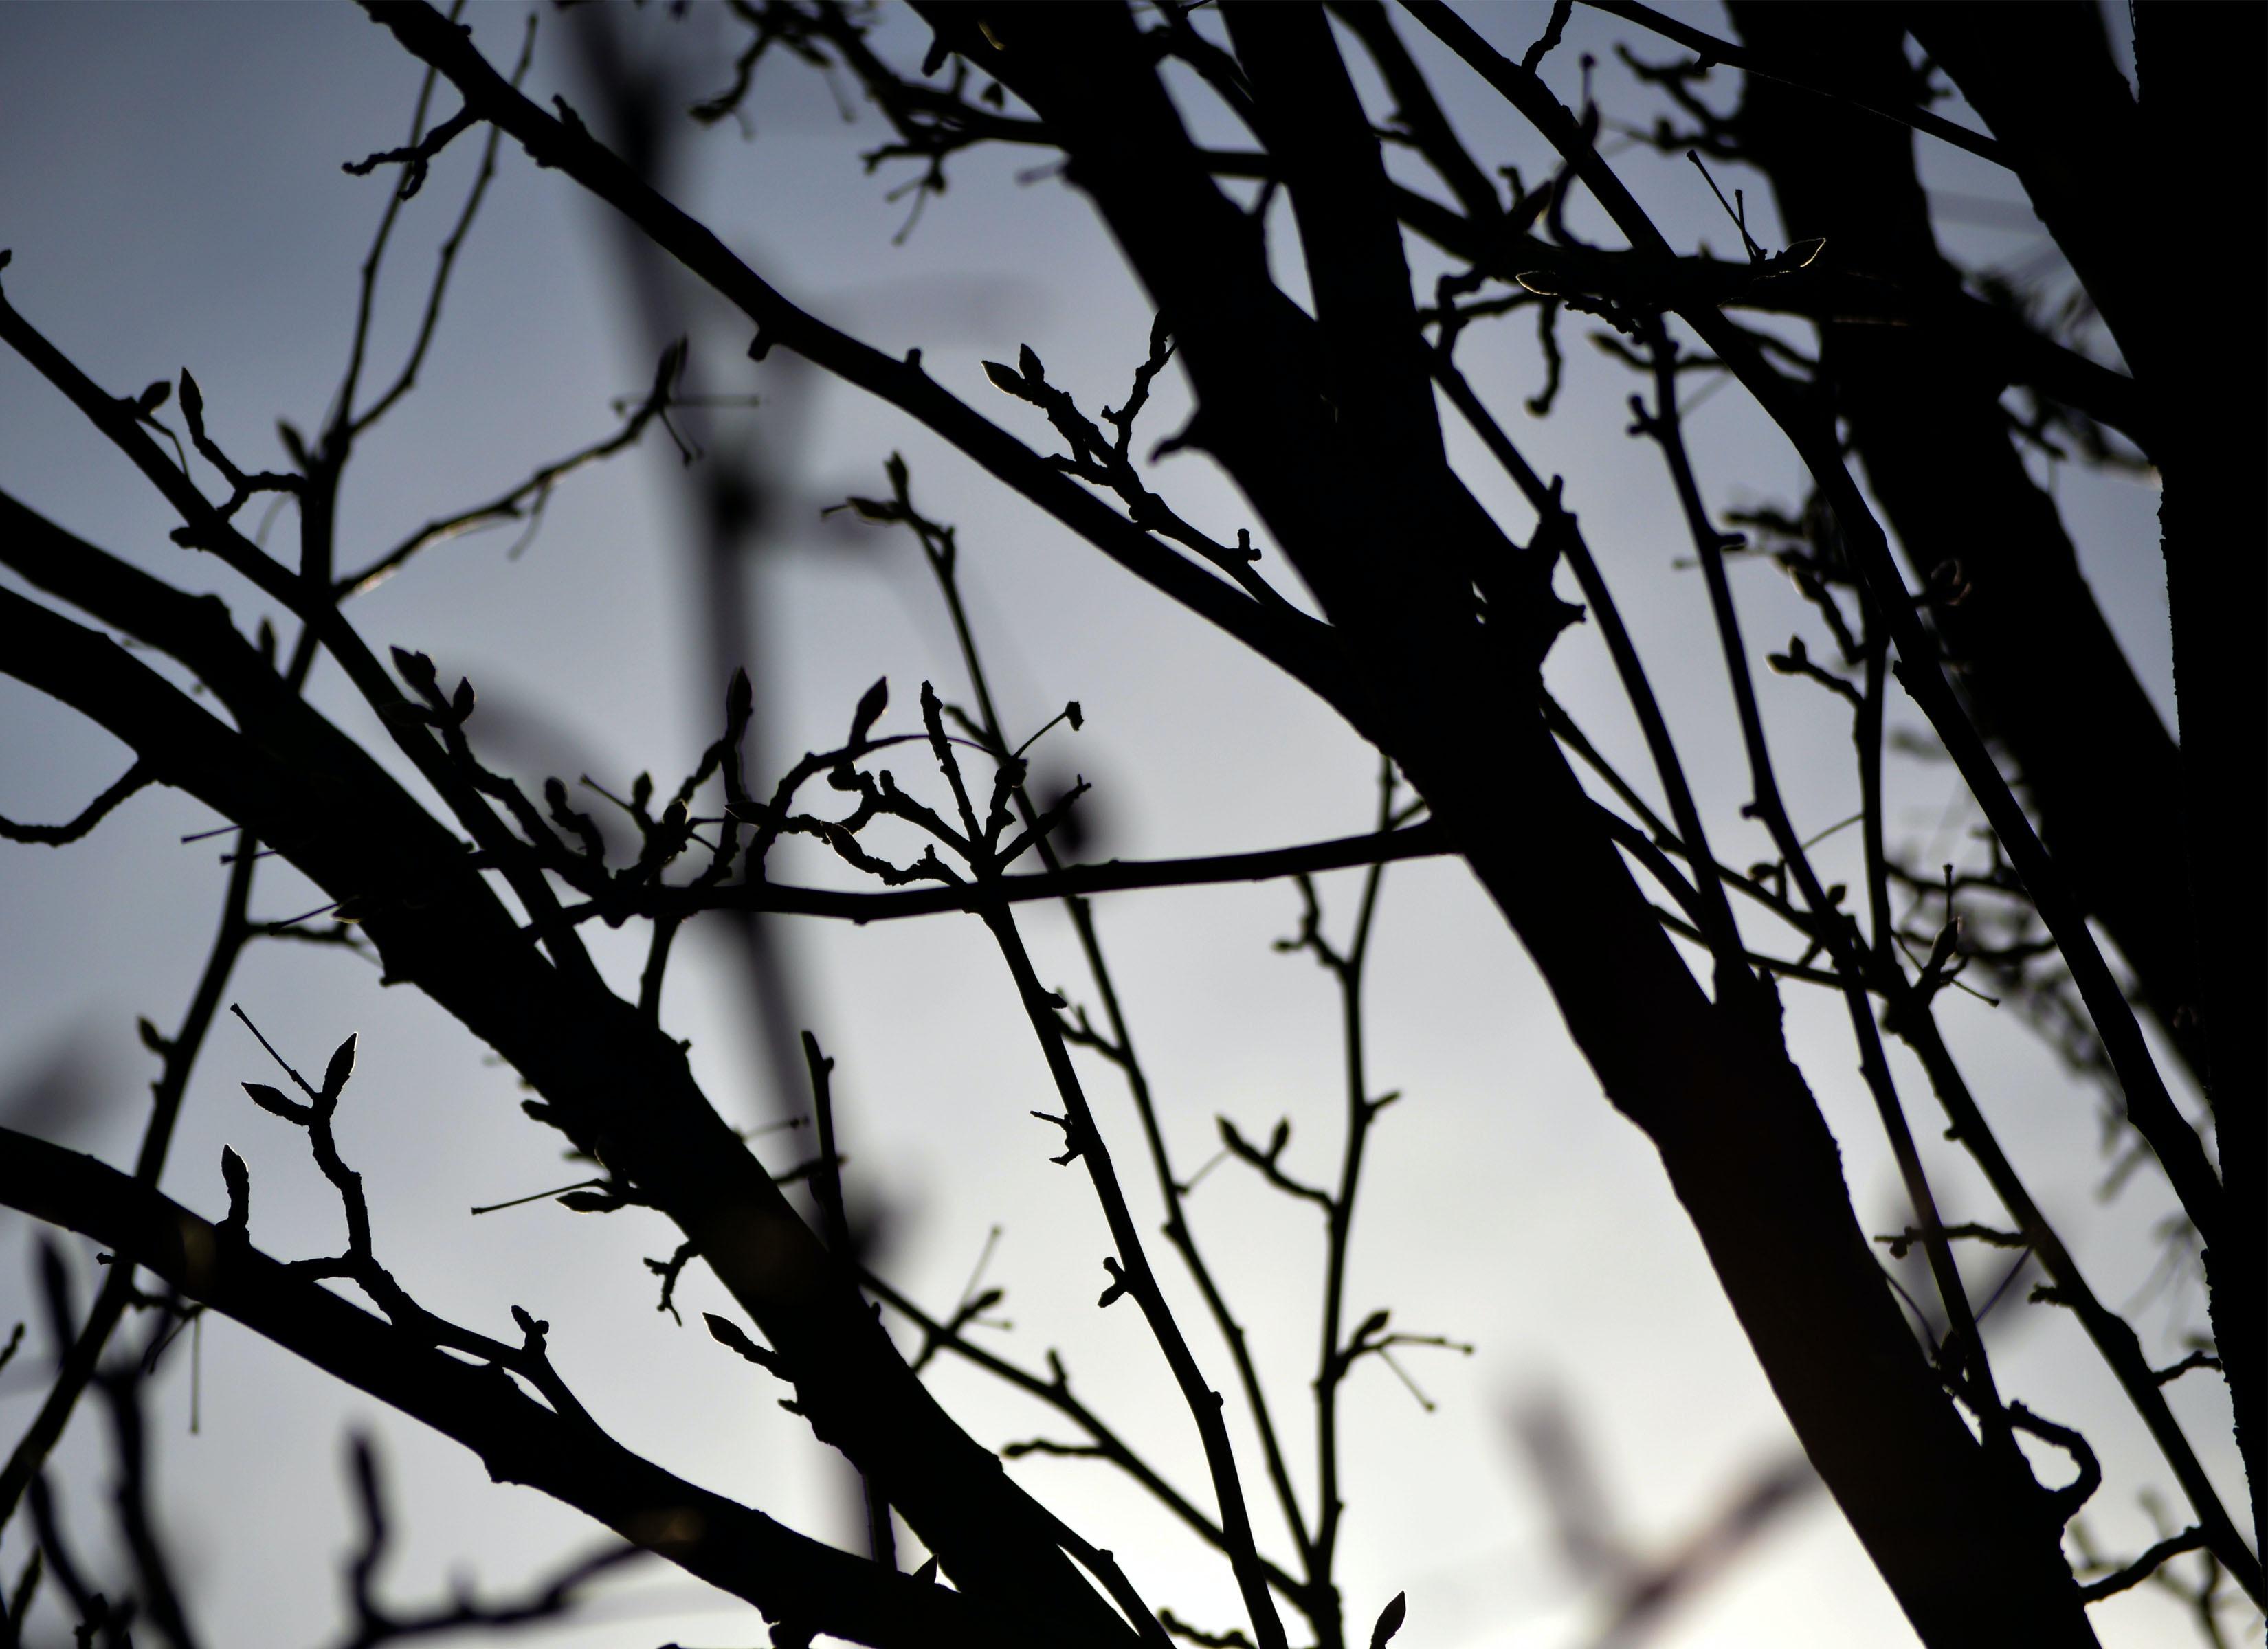 closeup photo of tree branch